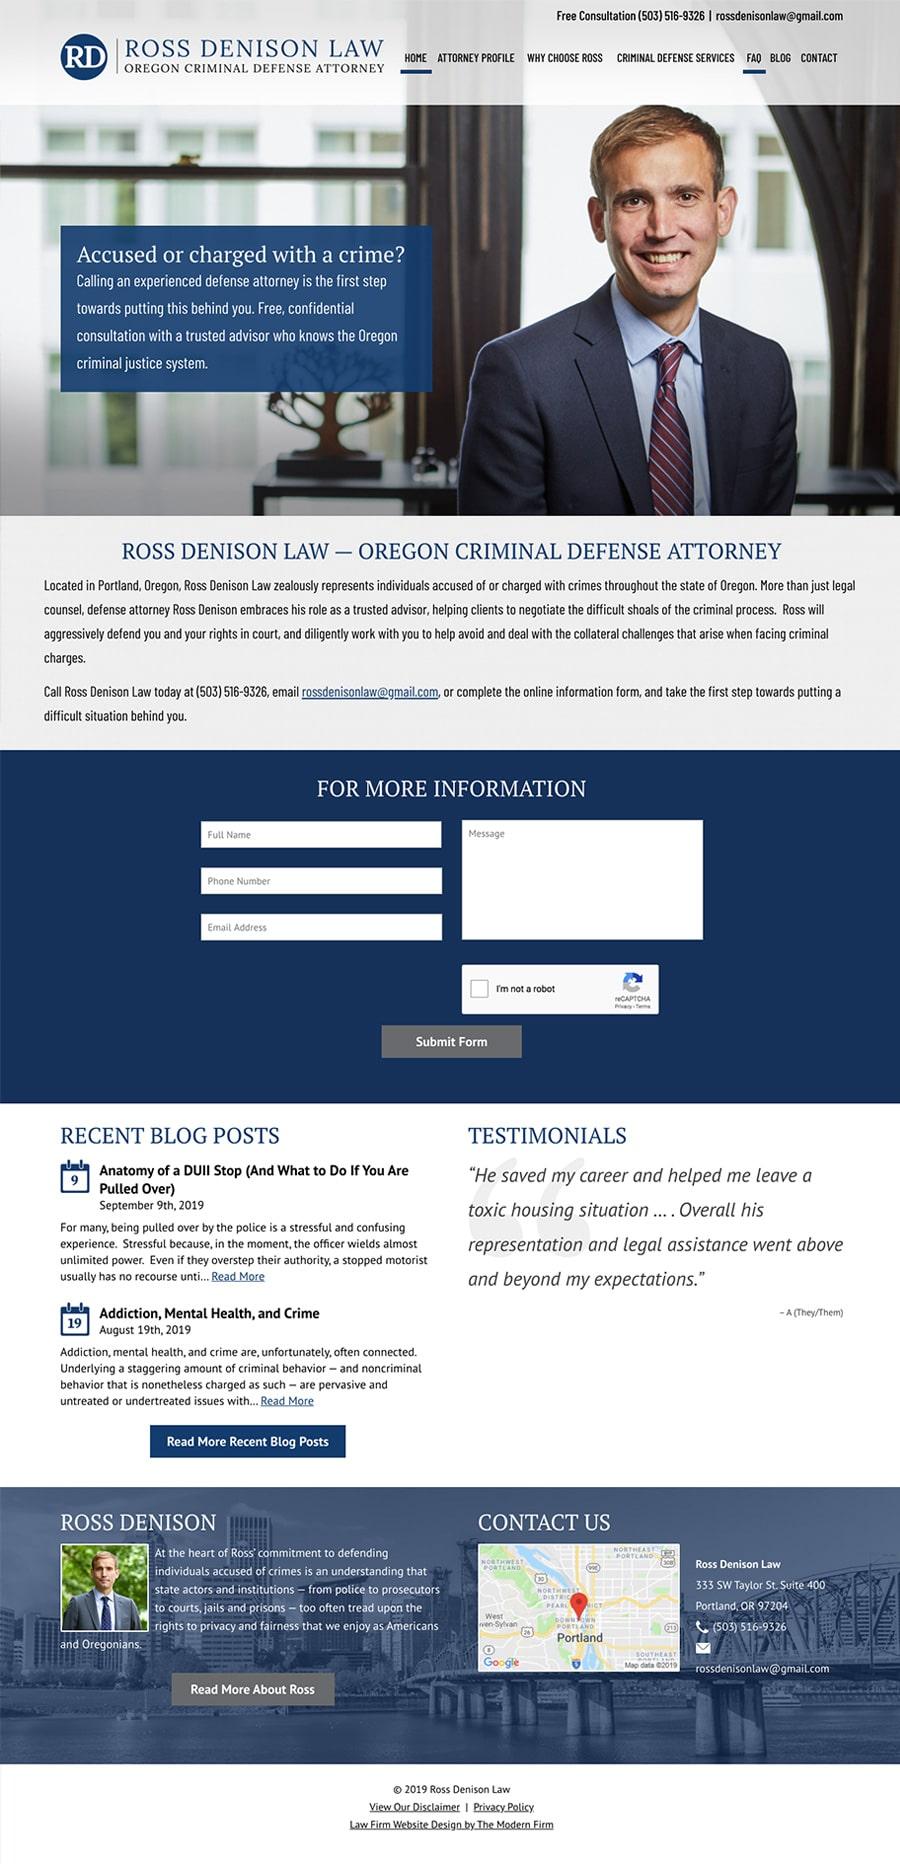 Law Firm Website Design for Ross Denison Law